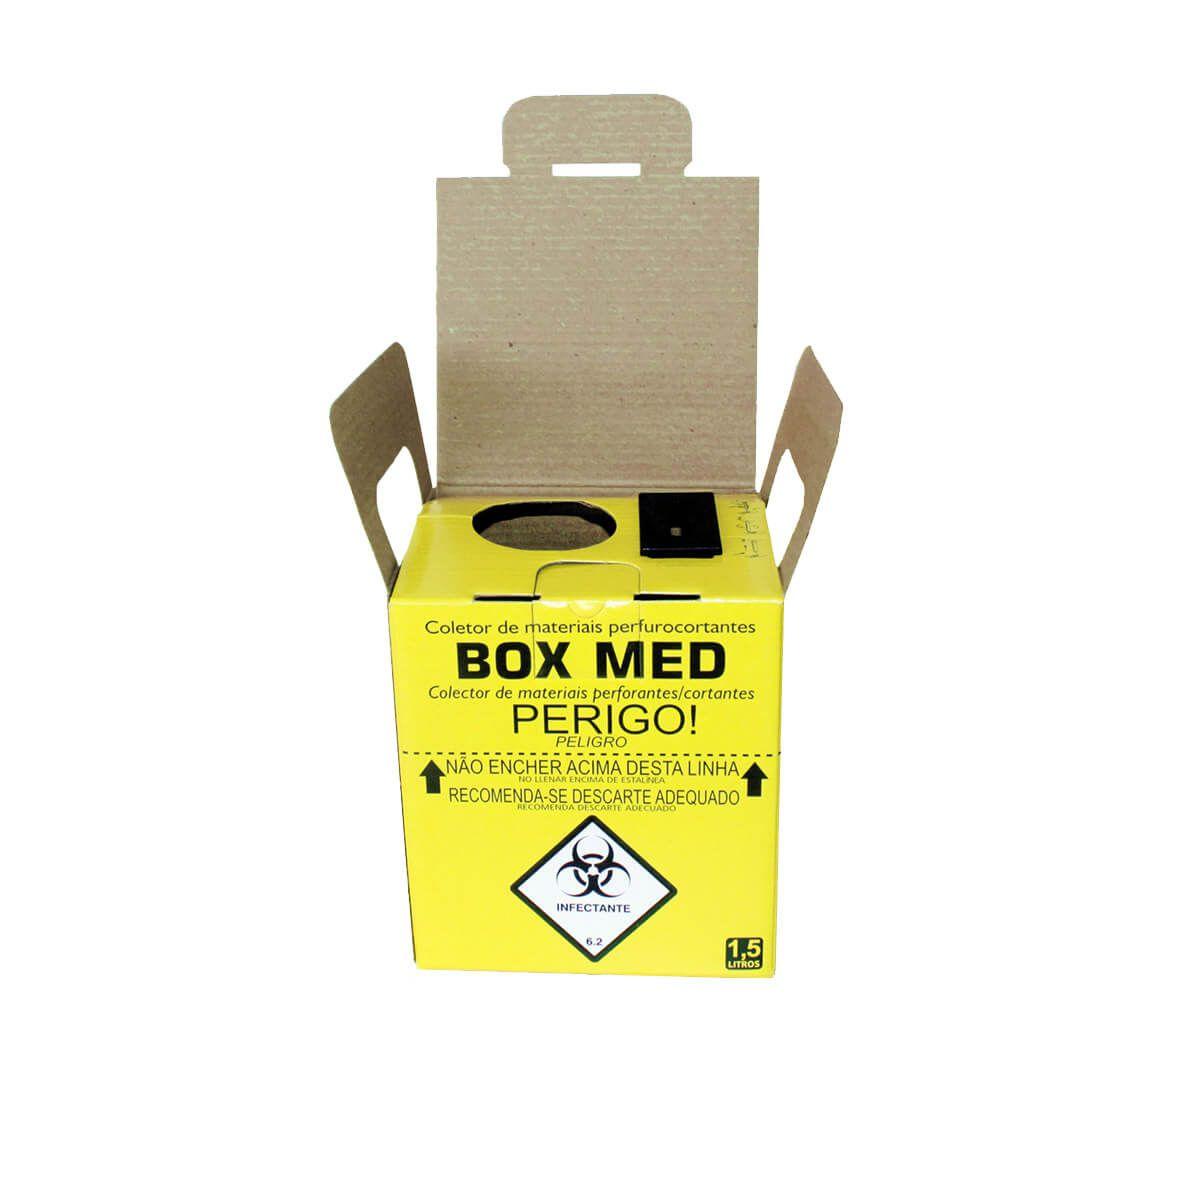 Kit 10 Caixa Coletora para Material Perfurocortante Descartável - Box Med